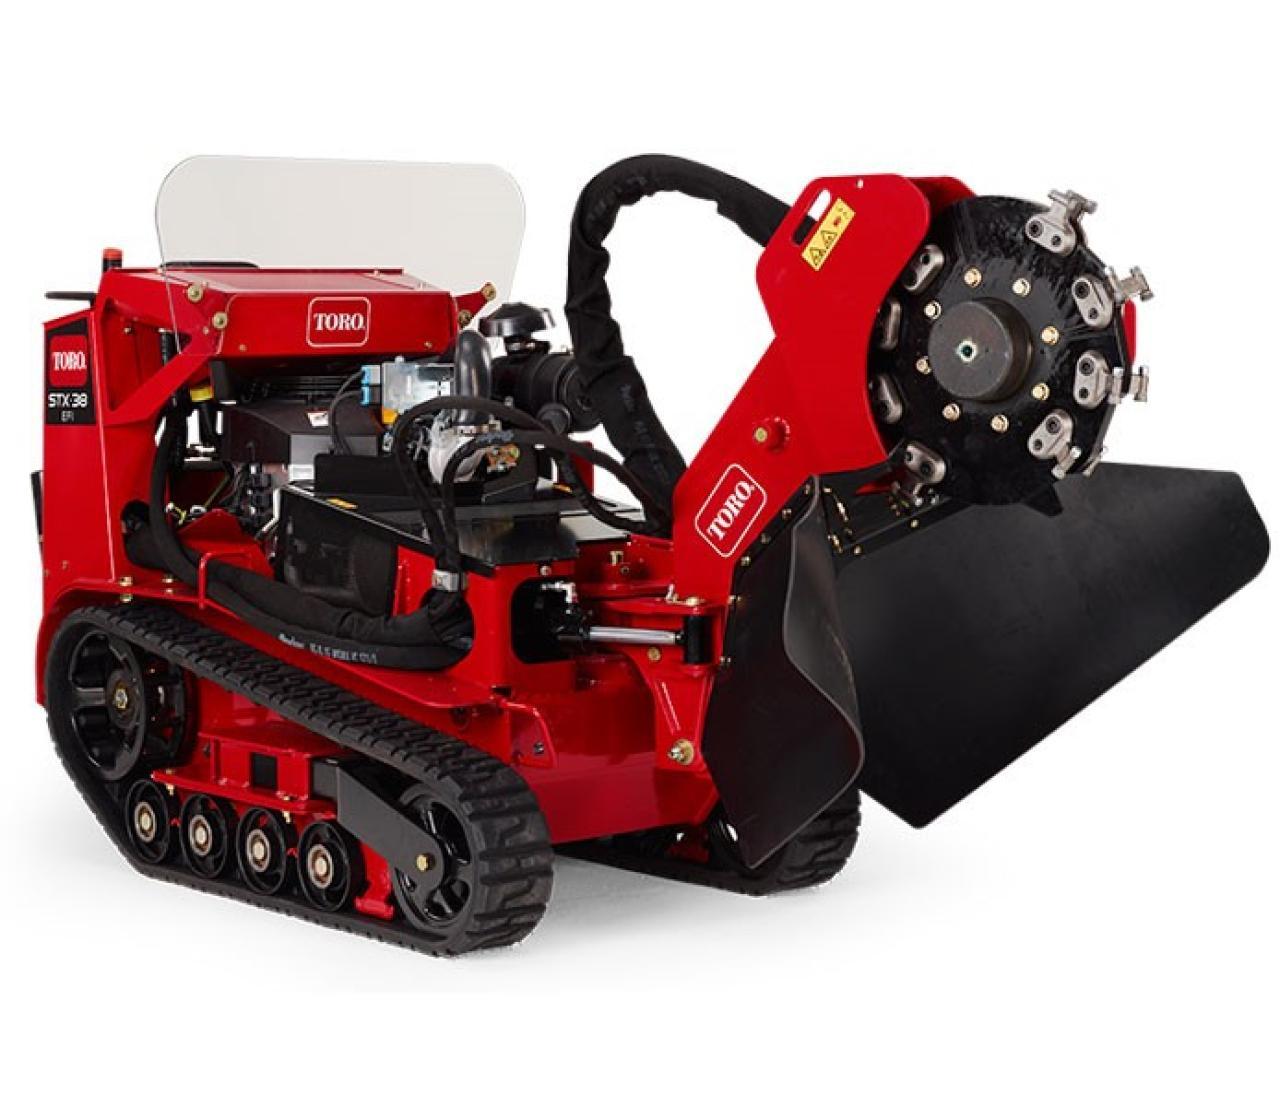 Toro STX 26